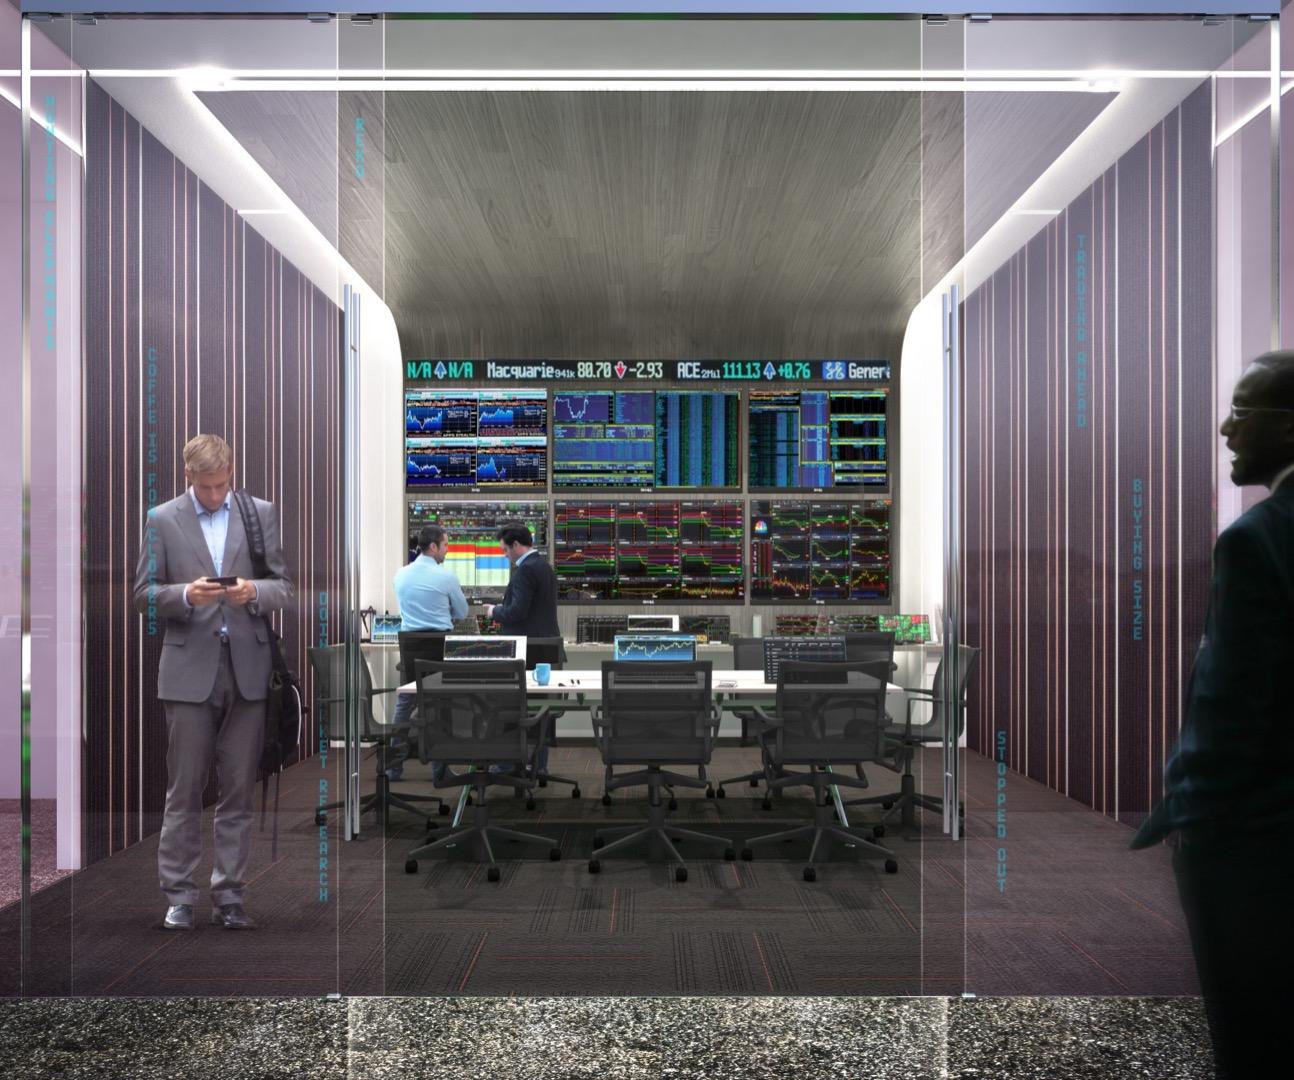 Wall Street Trader's Clubroom image